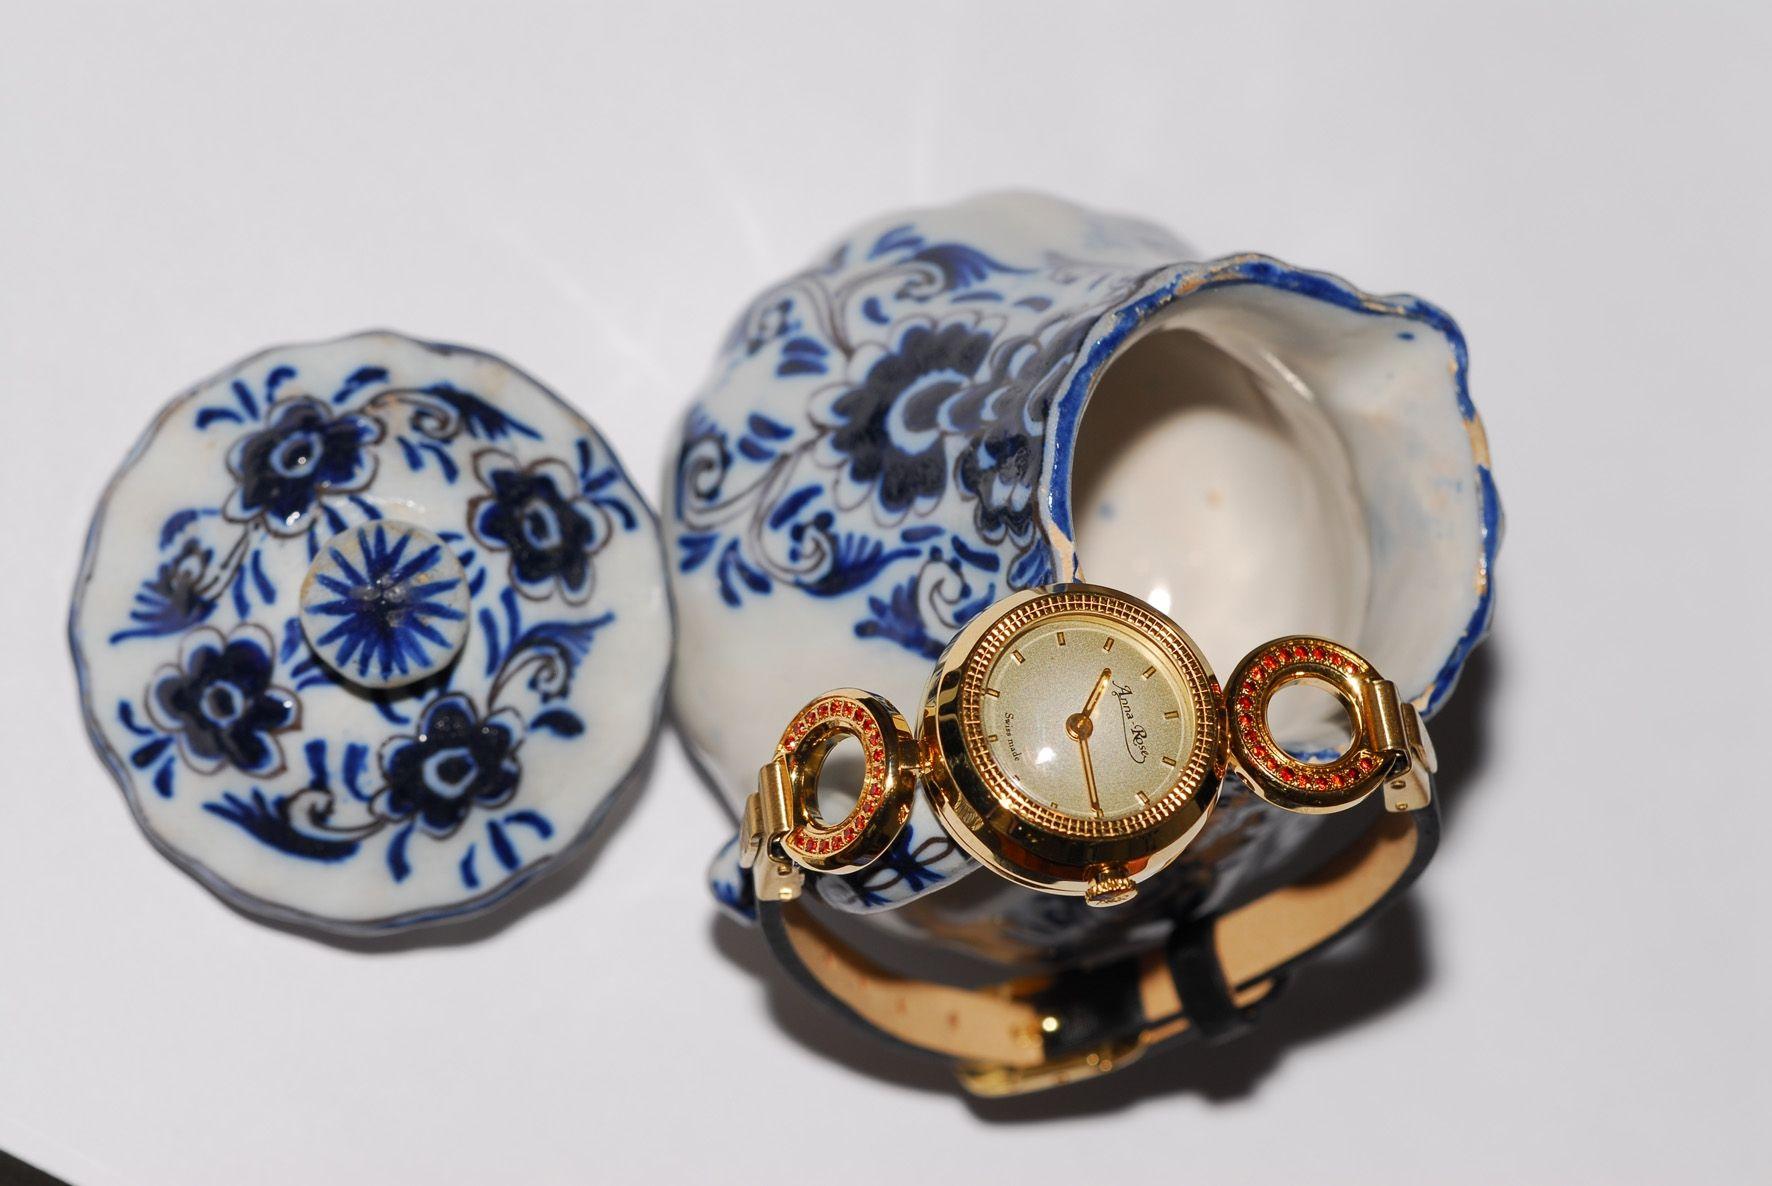 Mademoiselle EDITH - watch